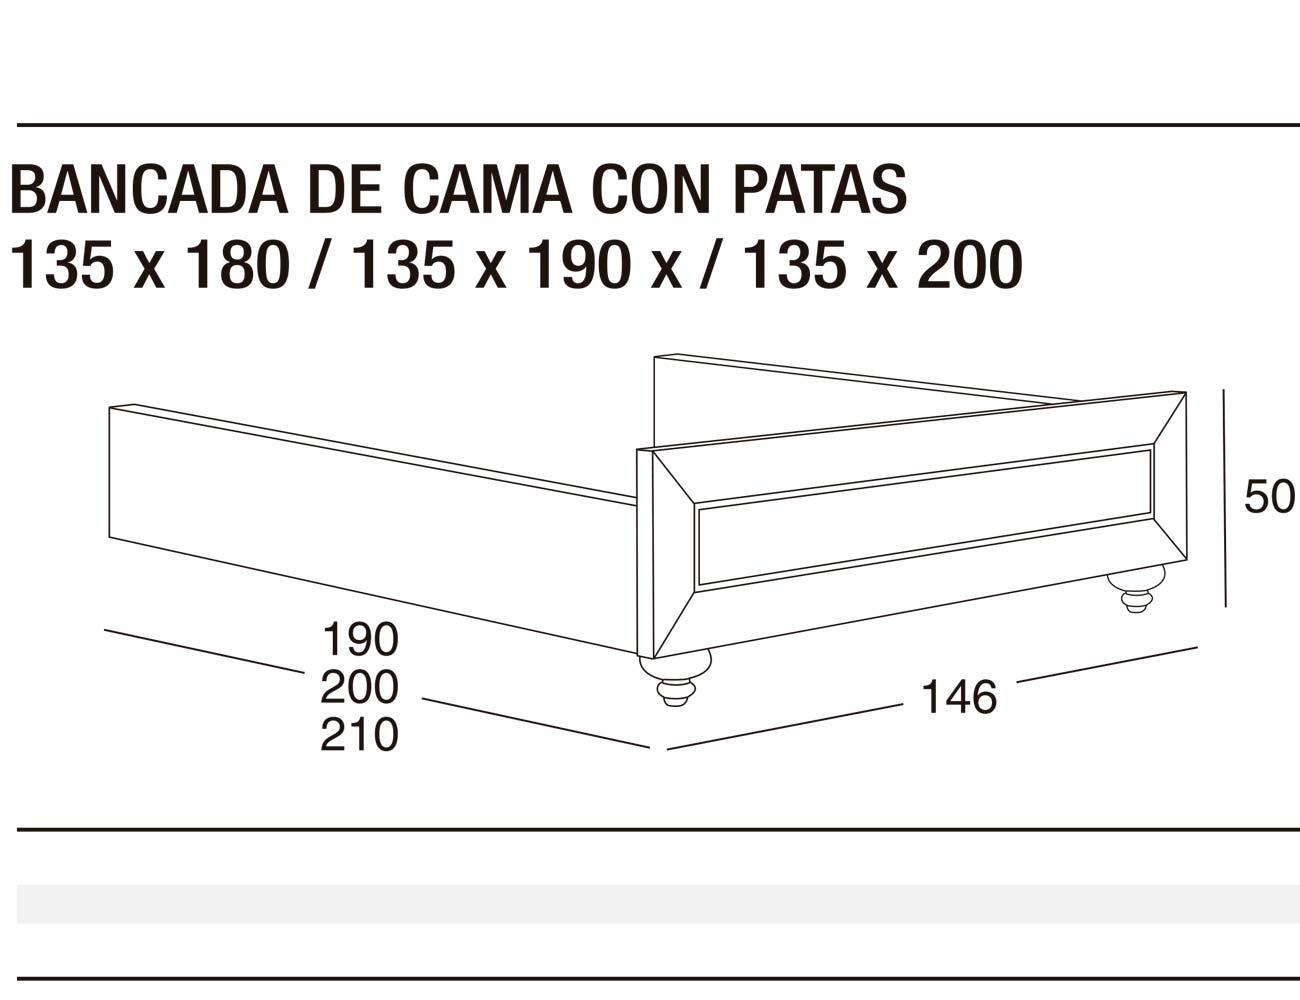 Bancada cama p 135x180 135x190 135x2002